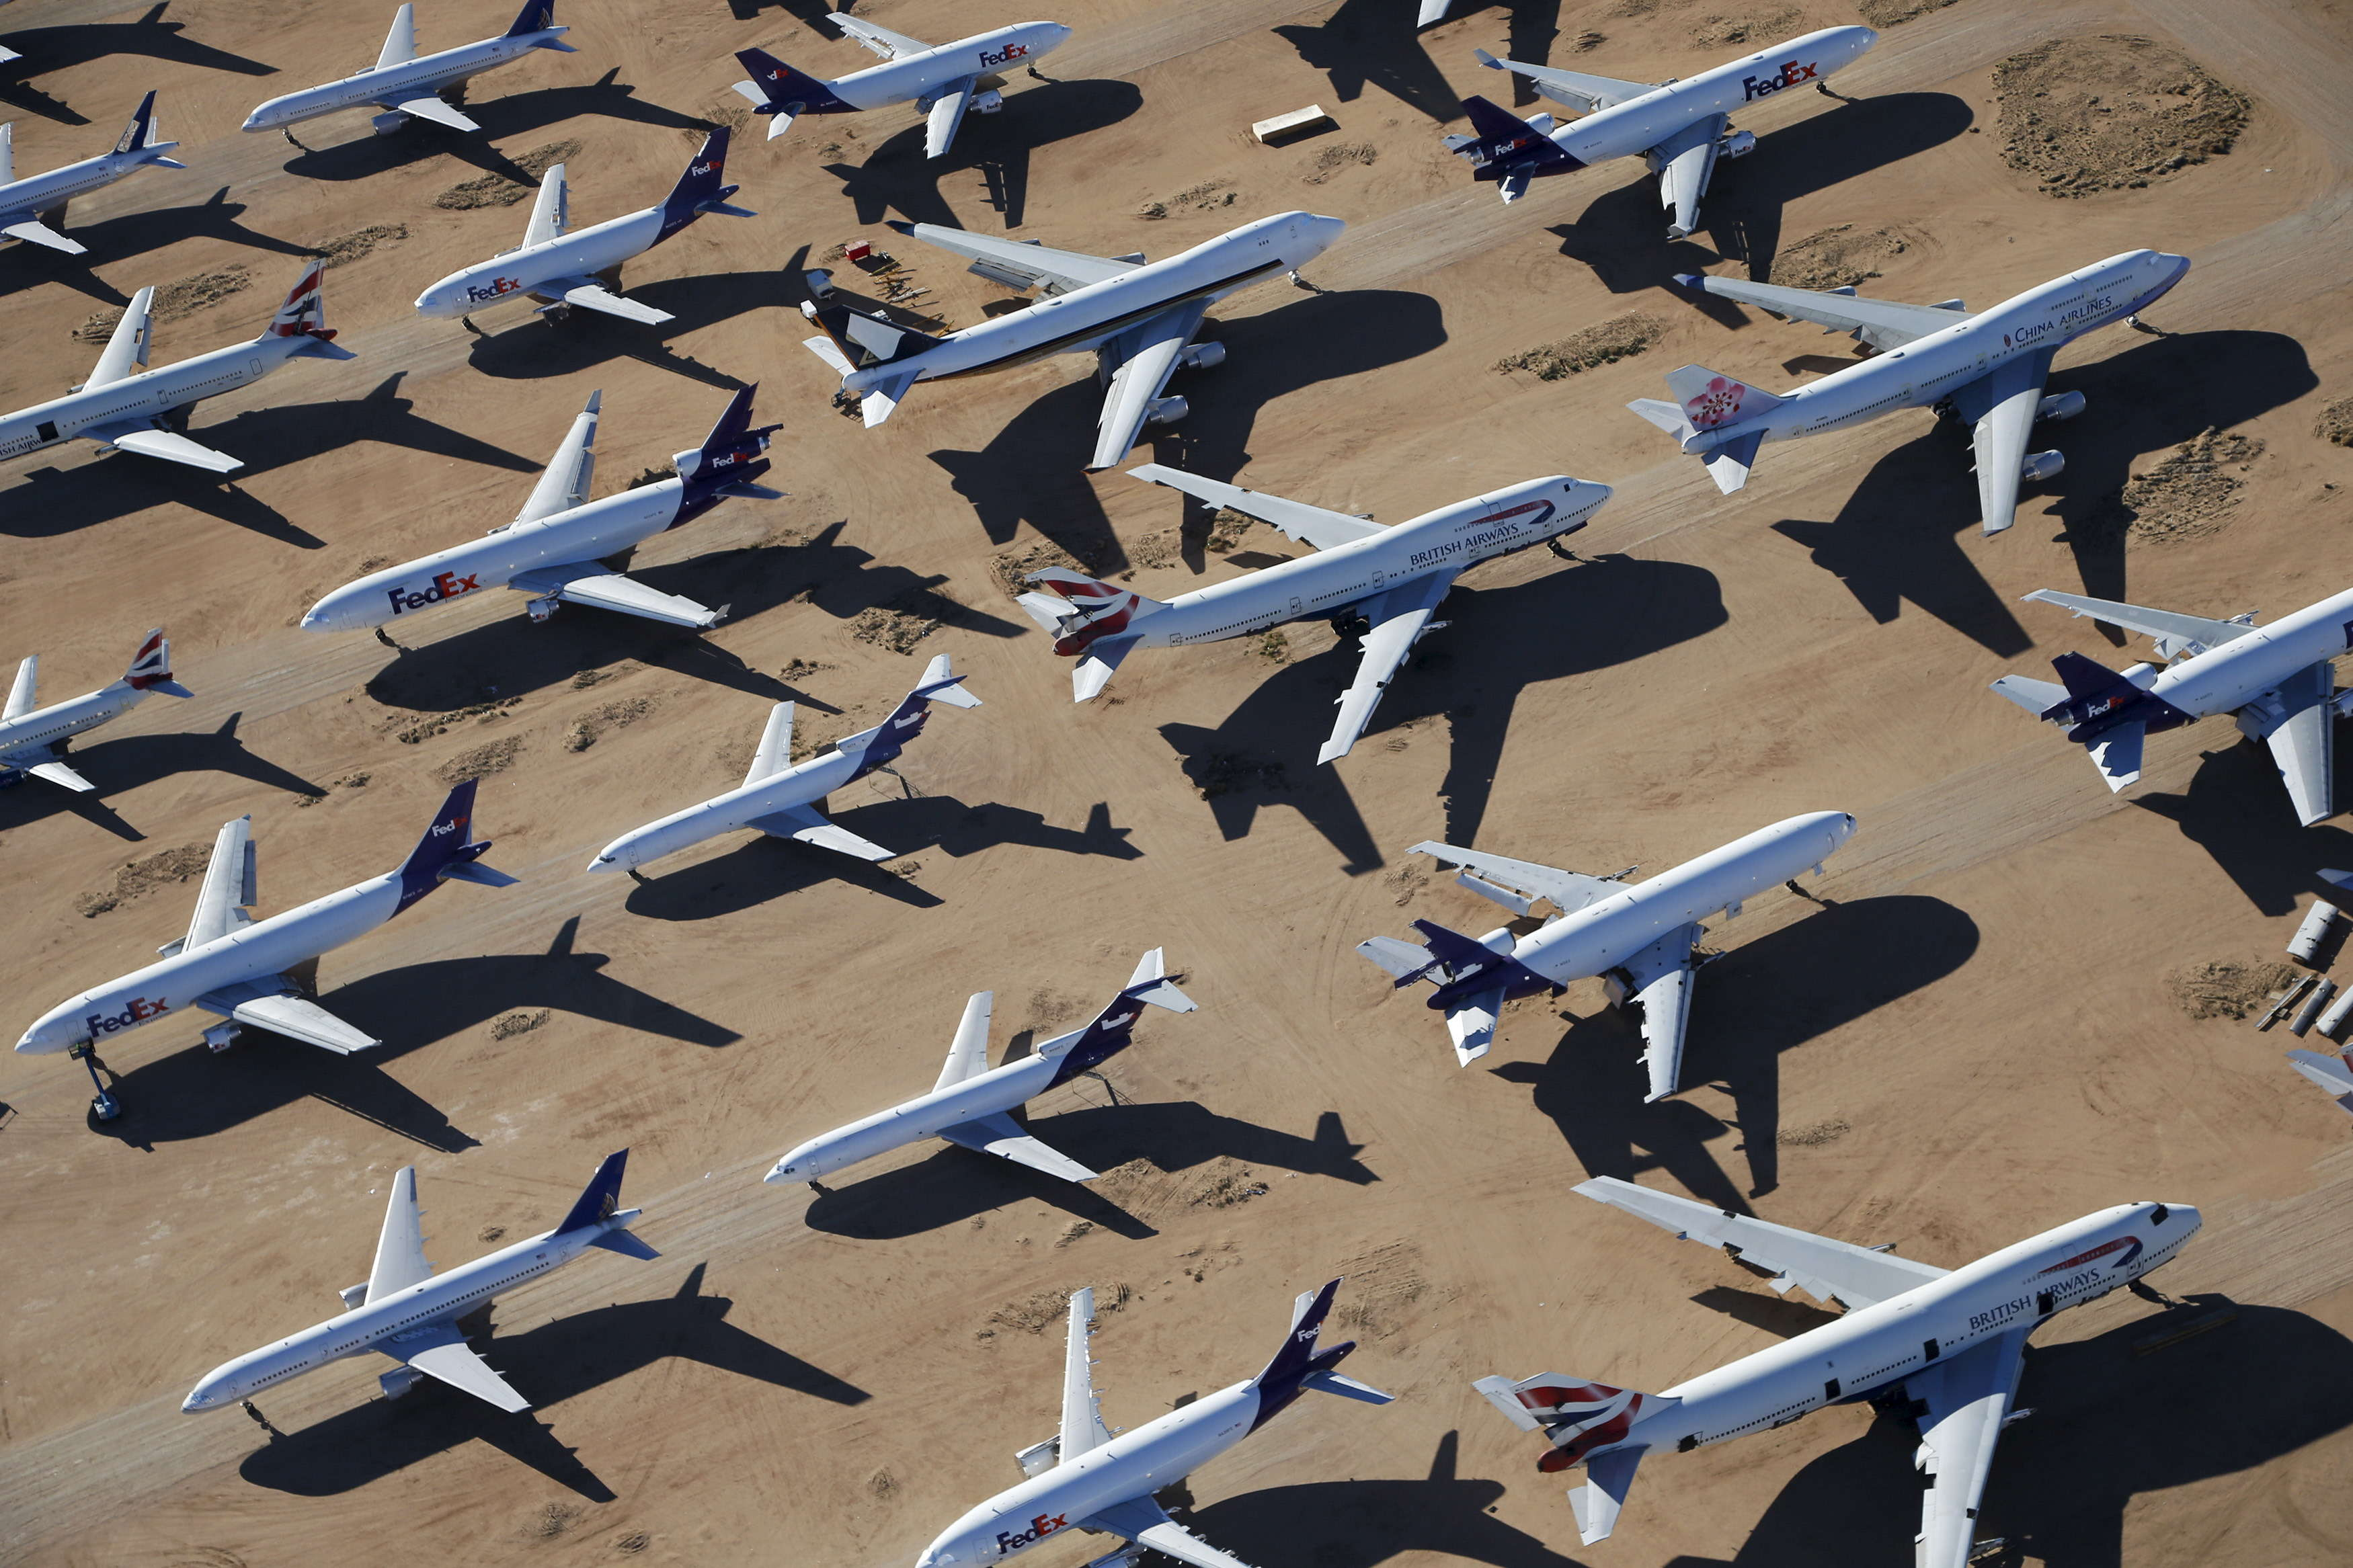 Airport – Take off with Natarajan